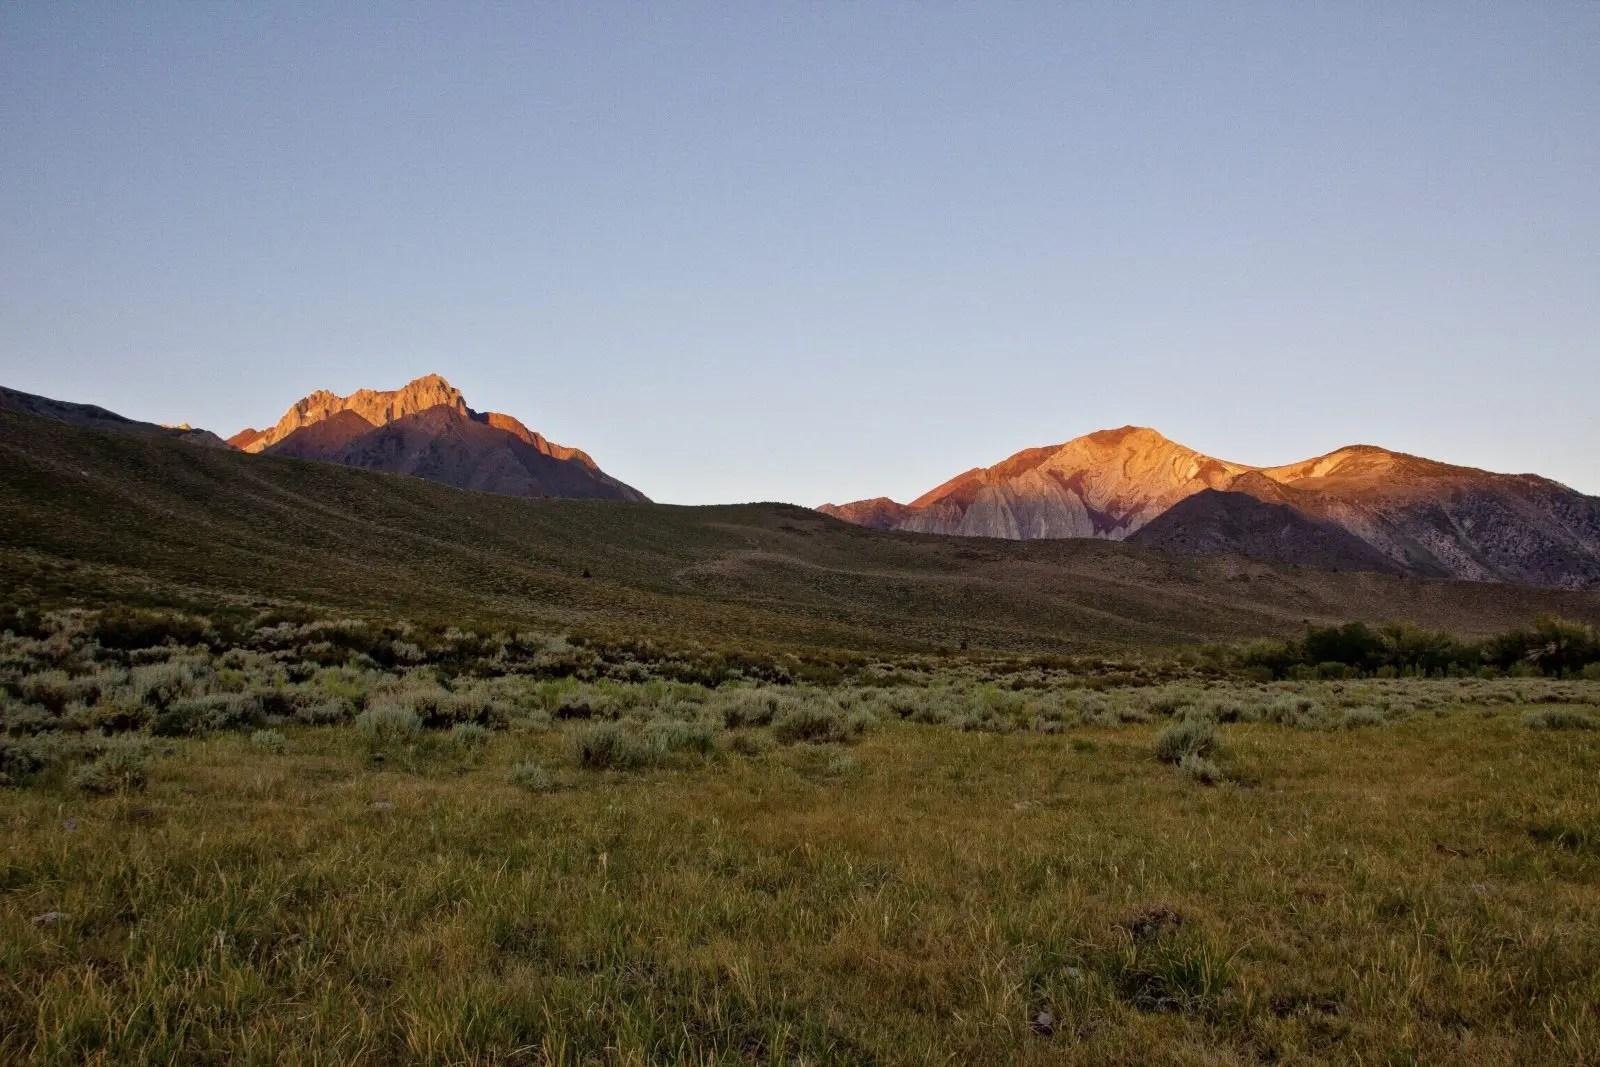 Sierra Nevada Aquatic Research Laboratory landscape